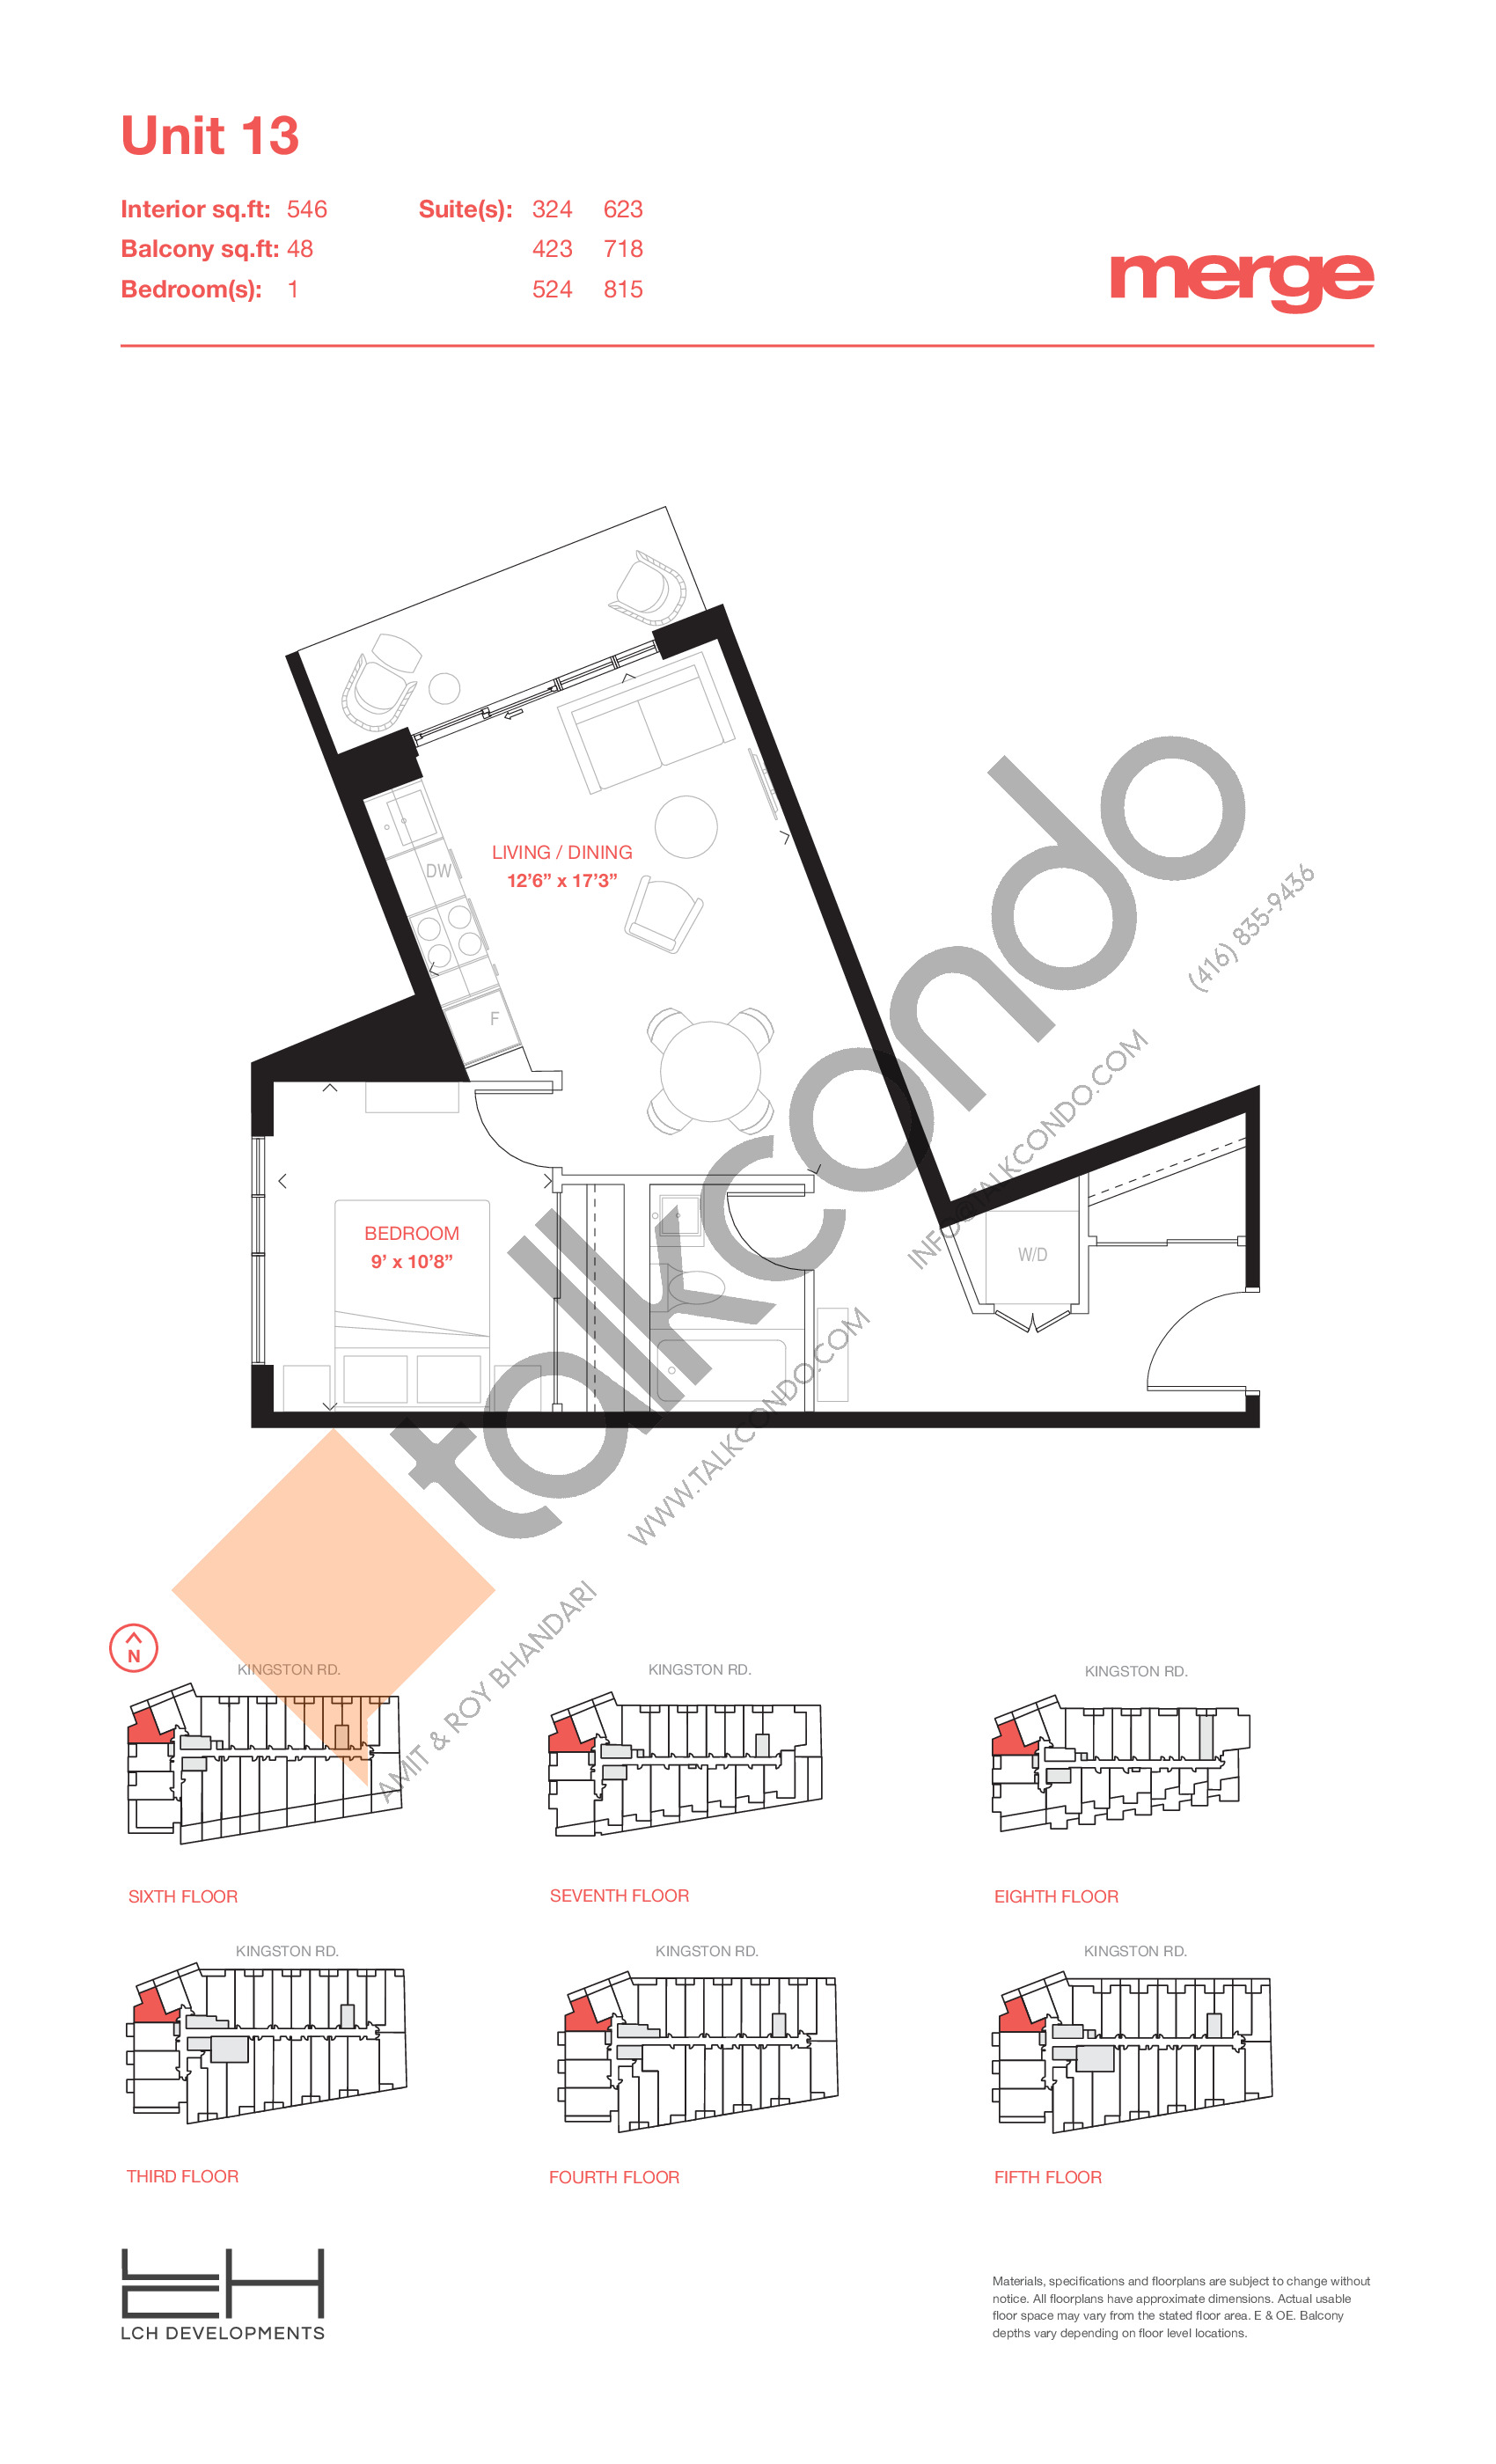 Unit 13 - Tower Floor Plan at Merge Condos - 546 sq.ft